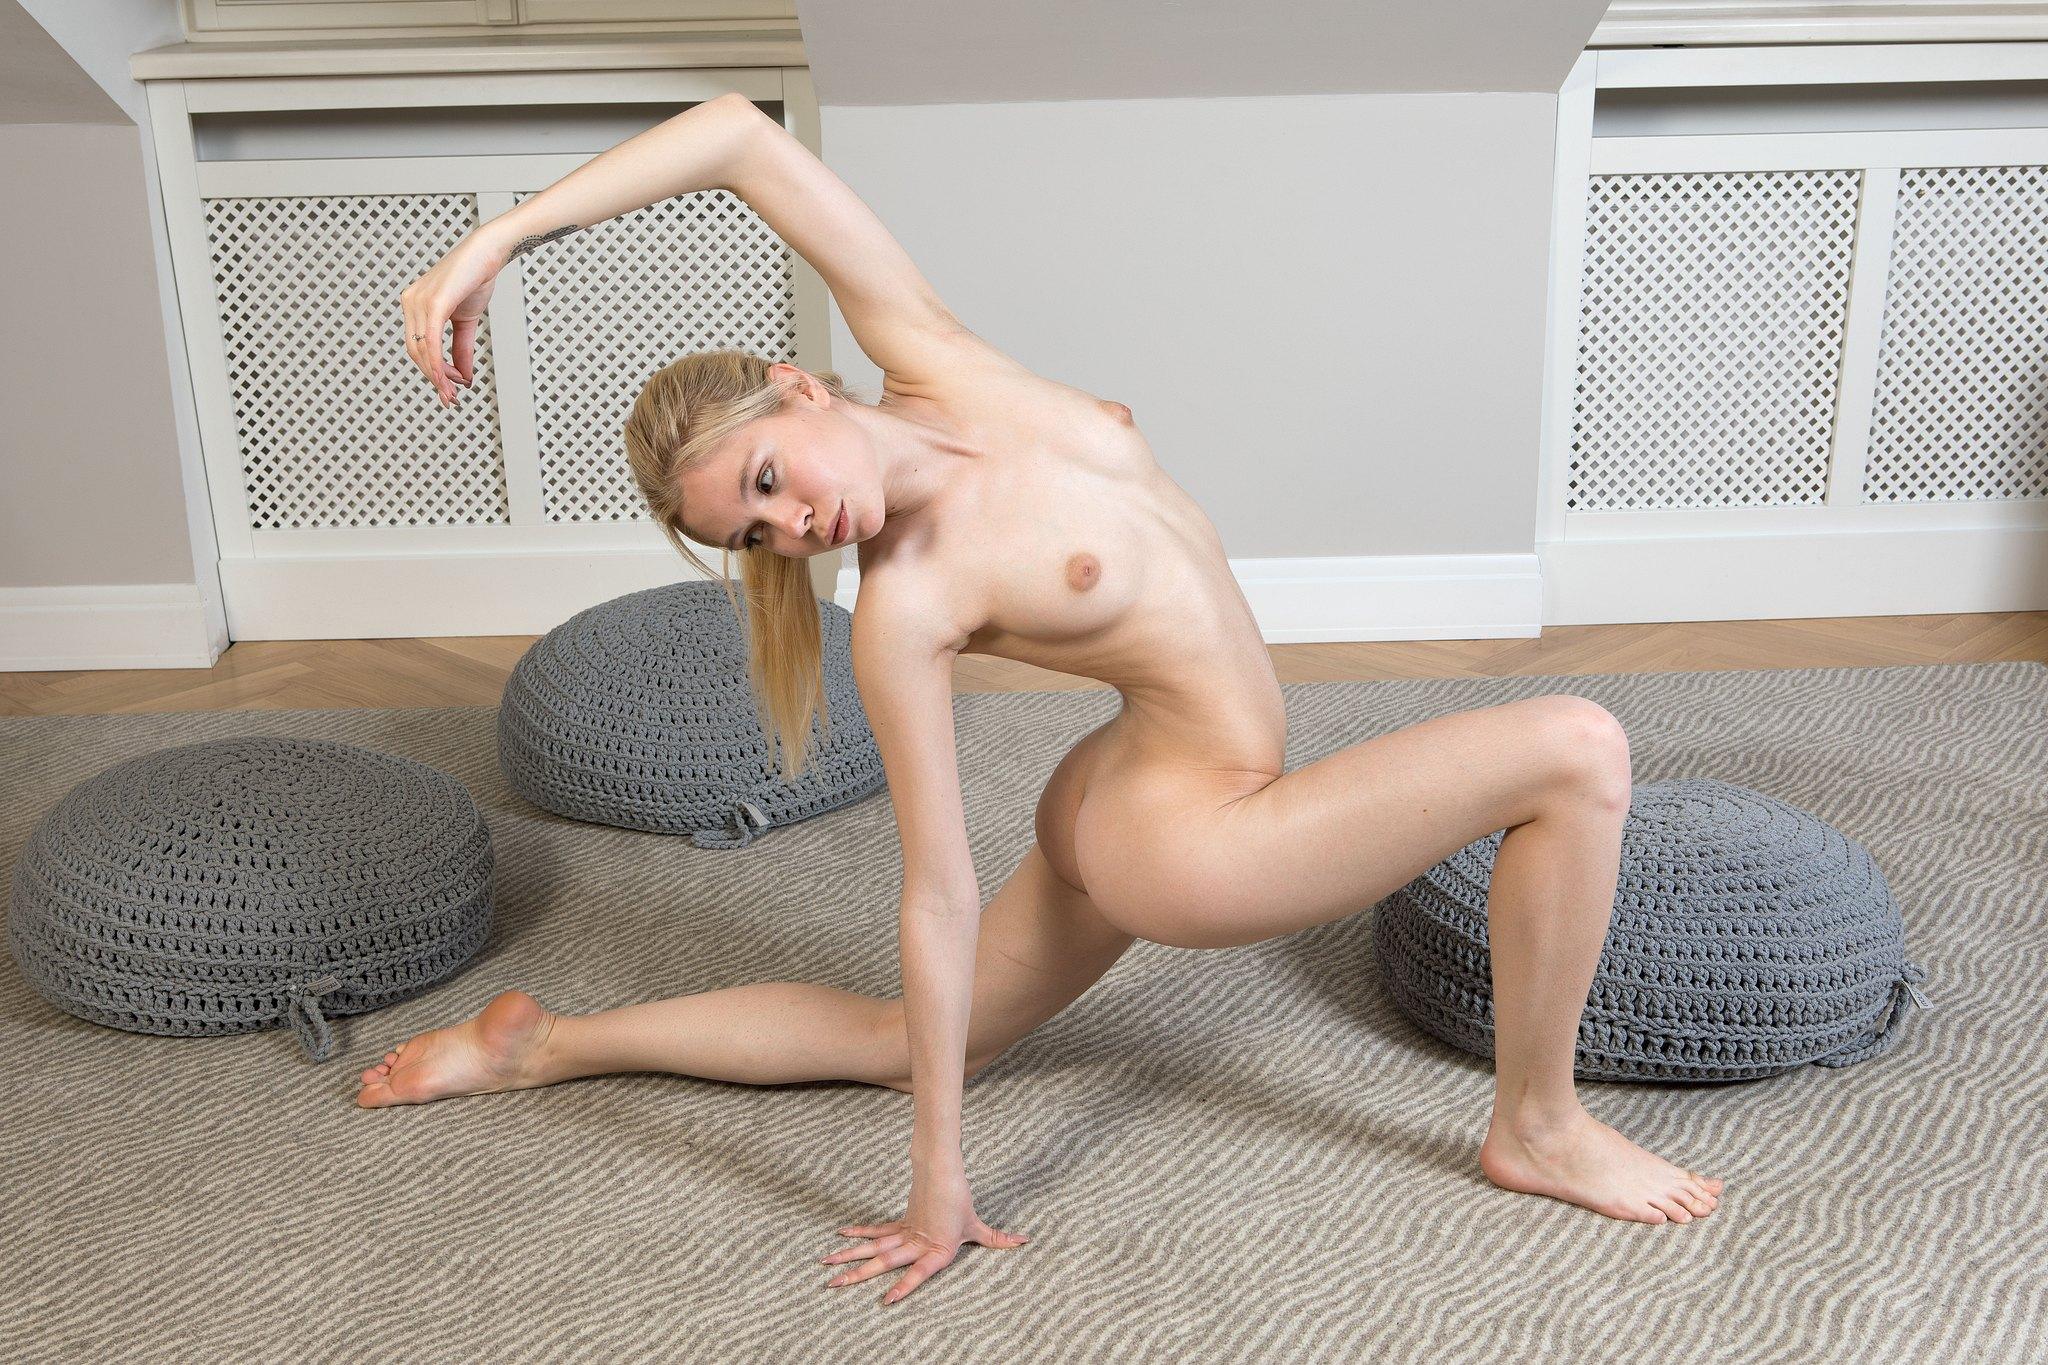 margot reese nude